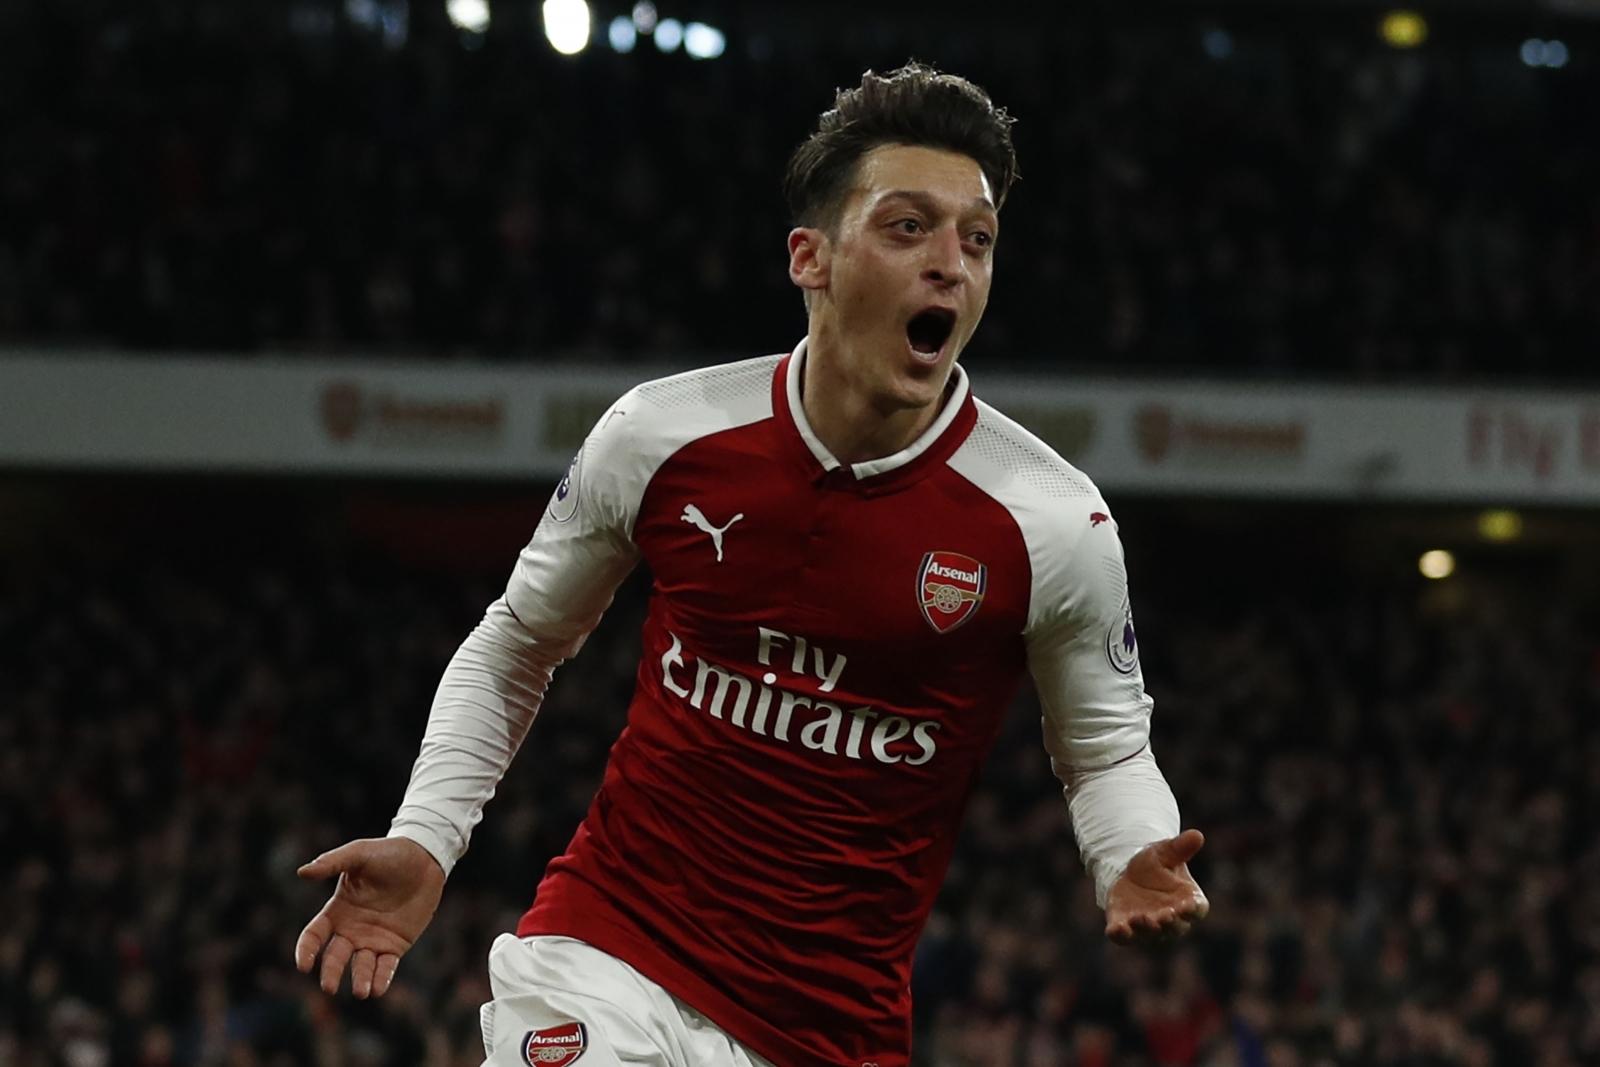 Real Madrid Wallpaper Full Hd Mesut Ozil Signs New Three And A Half Year Deal At Arsenal